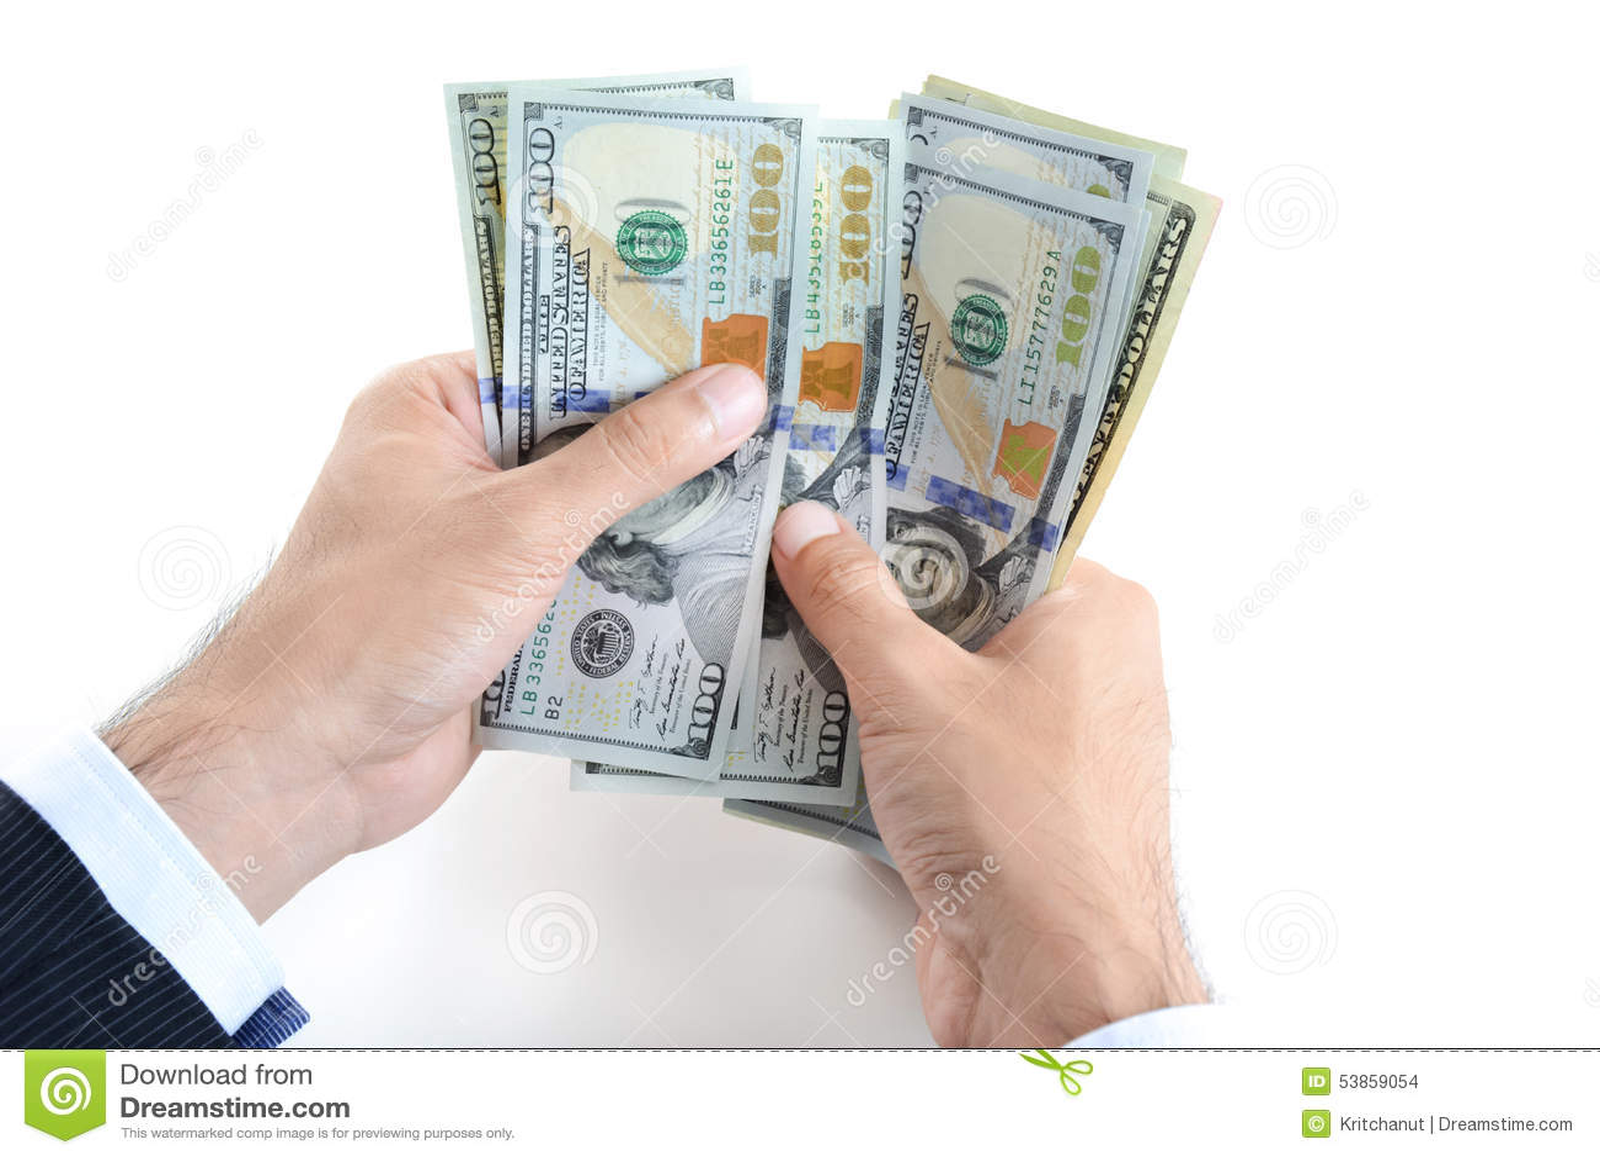 Businessman Hands Counting Money Us Dollar Usd Bills